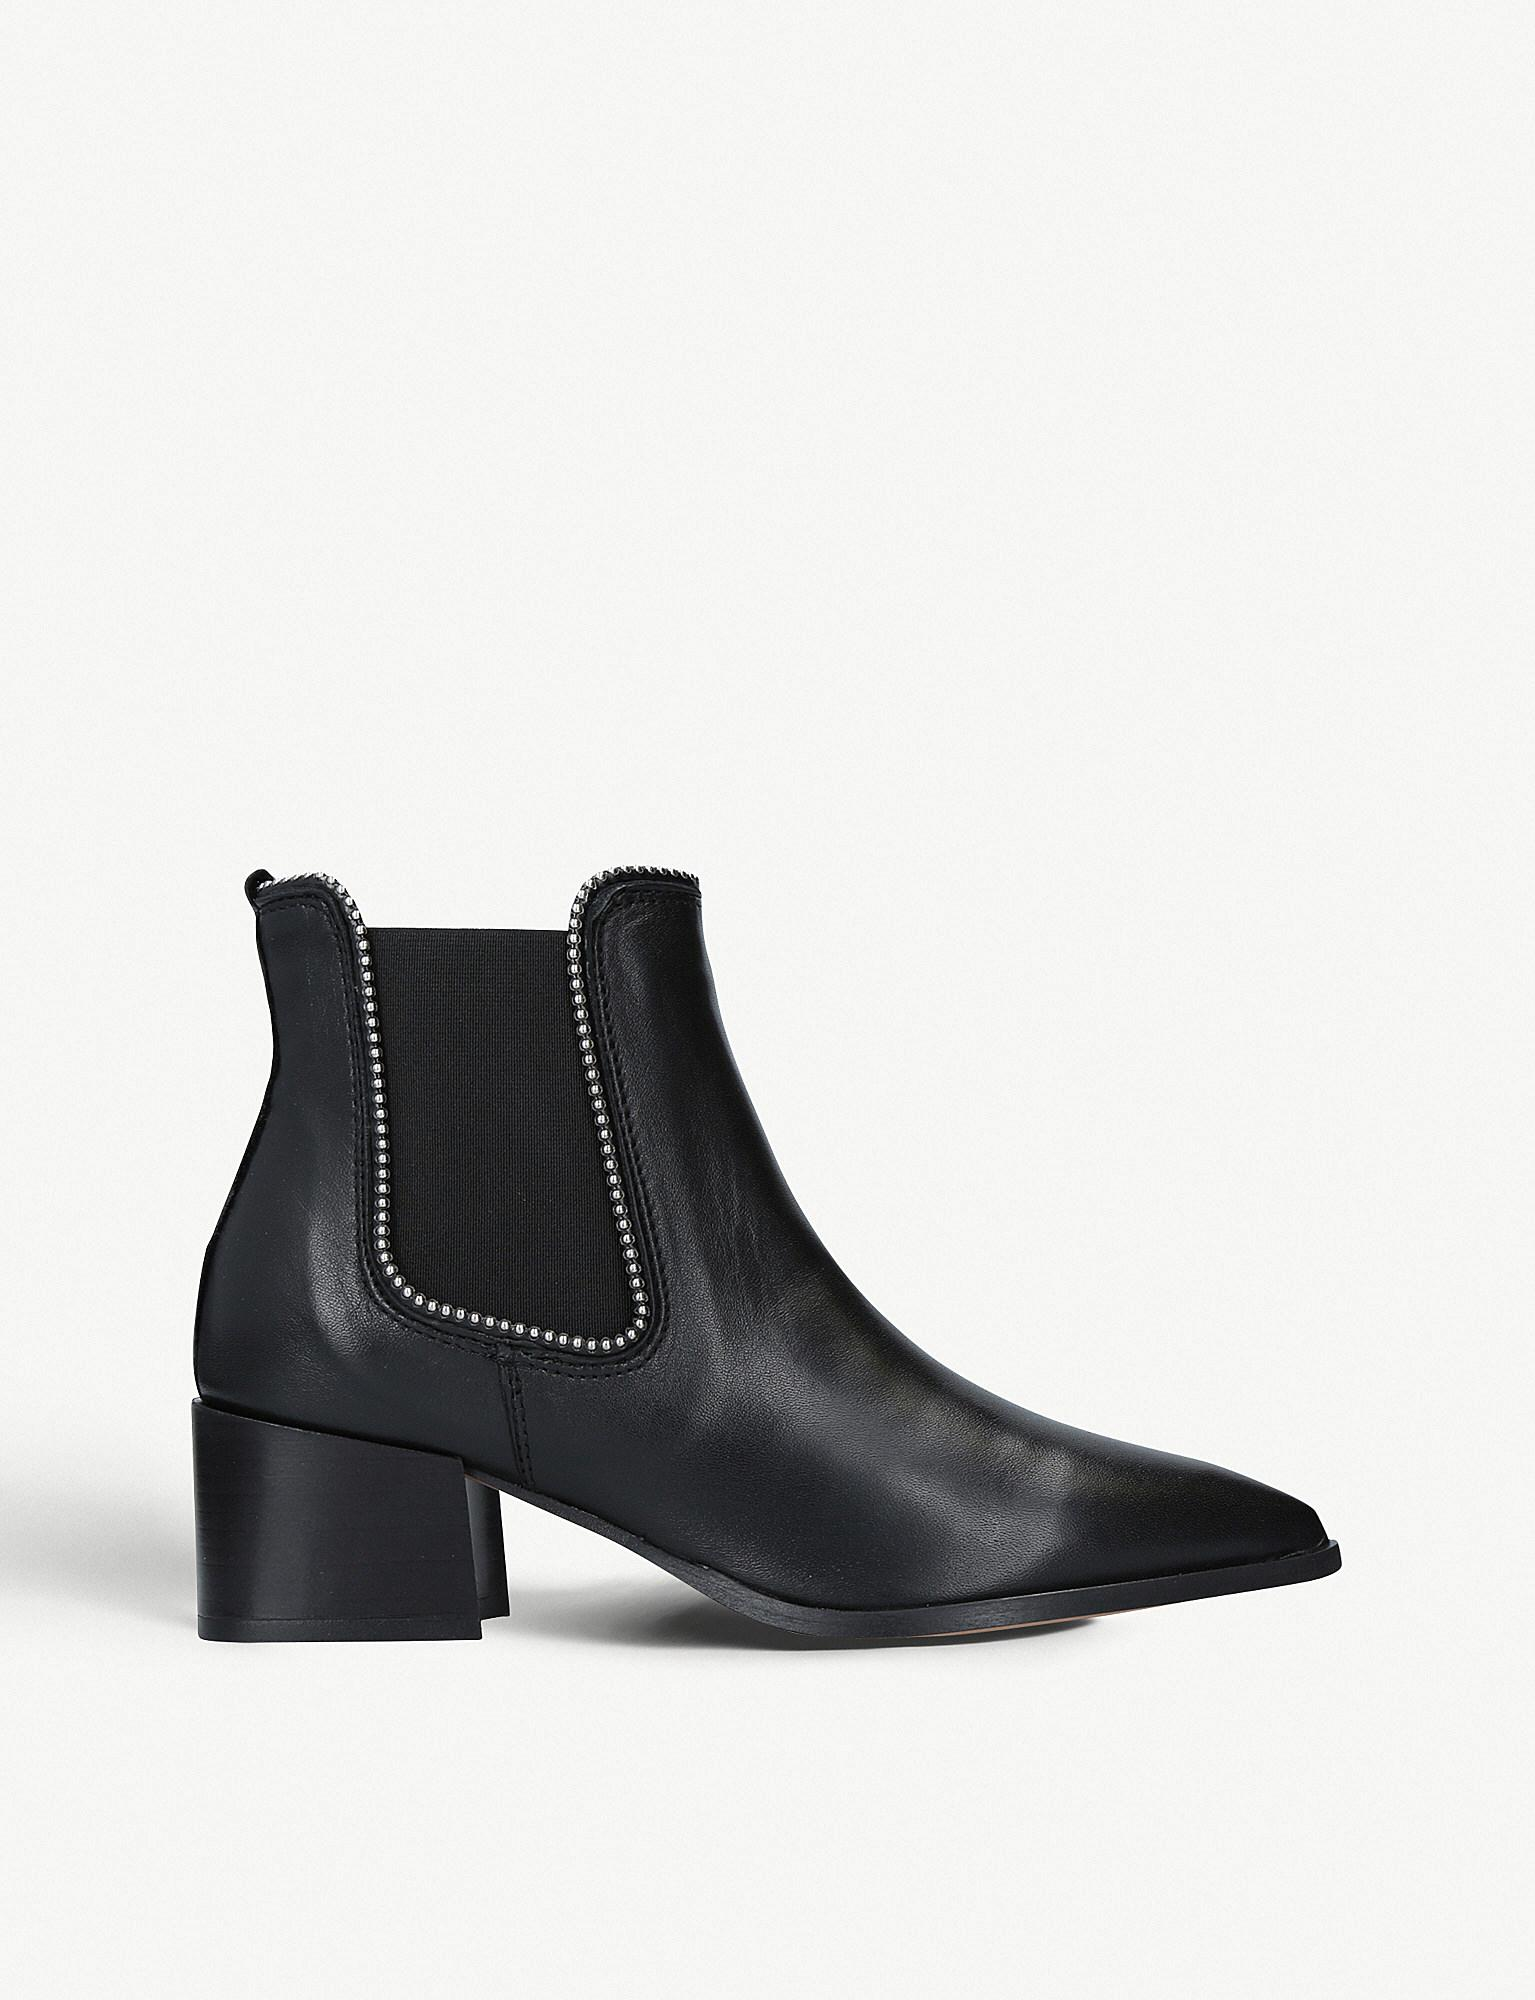 aae2142747fe Lyst - Carvela Kurt Geiger Spire Studded Leather Chelsea Boots in Black